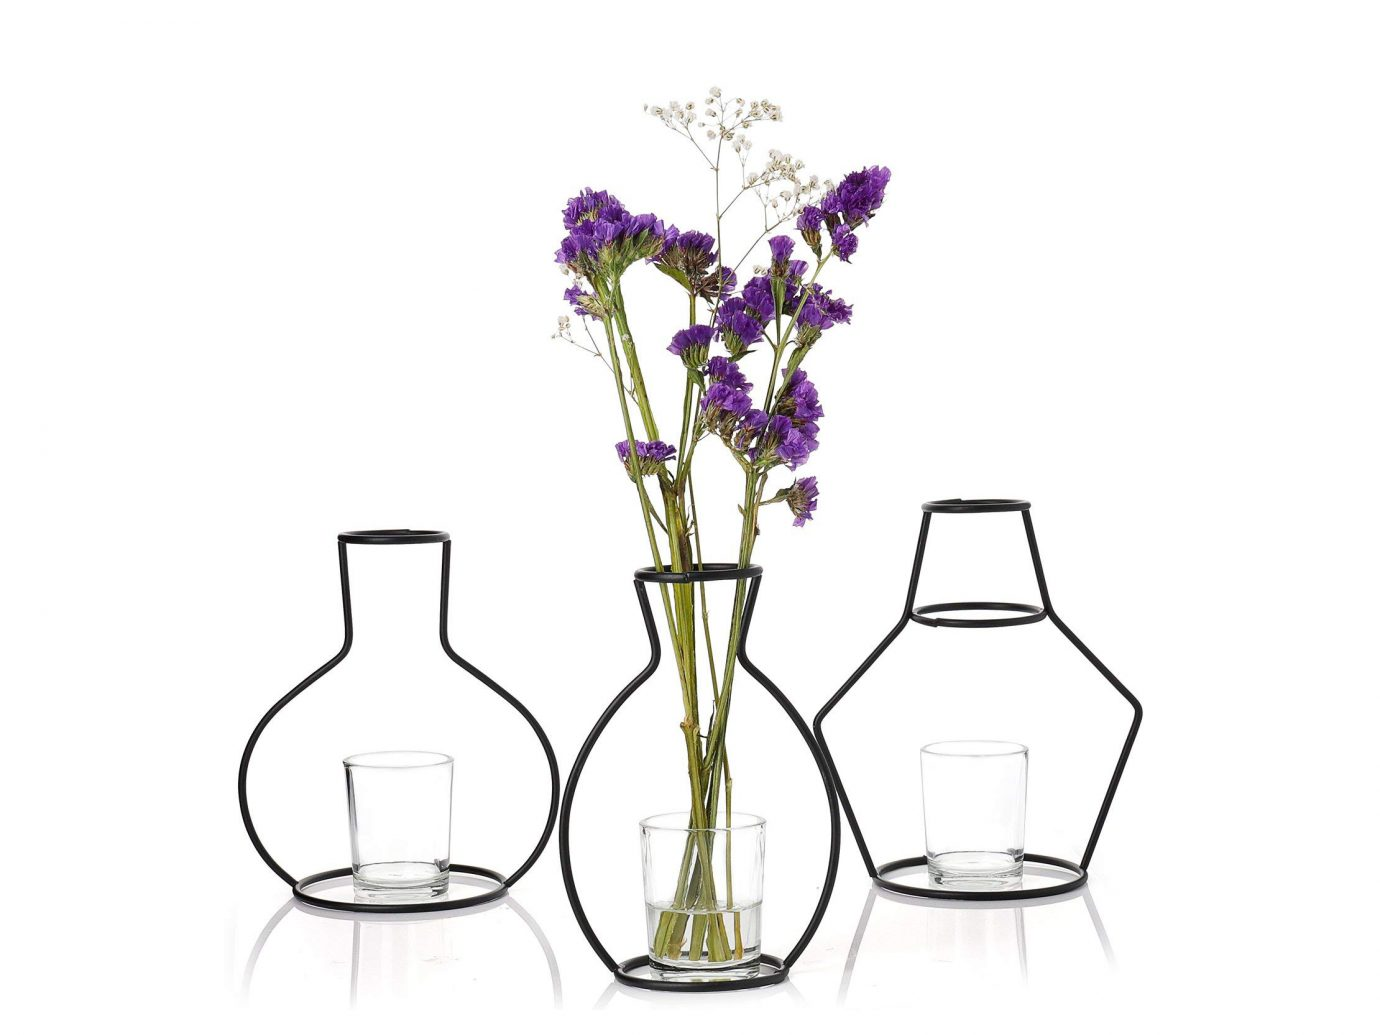 Greenaholics Decorative Vases